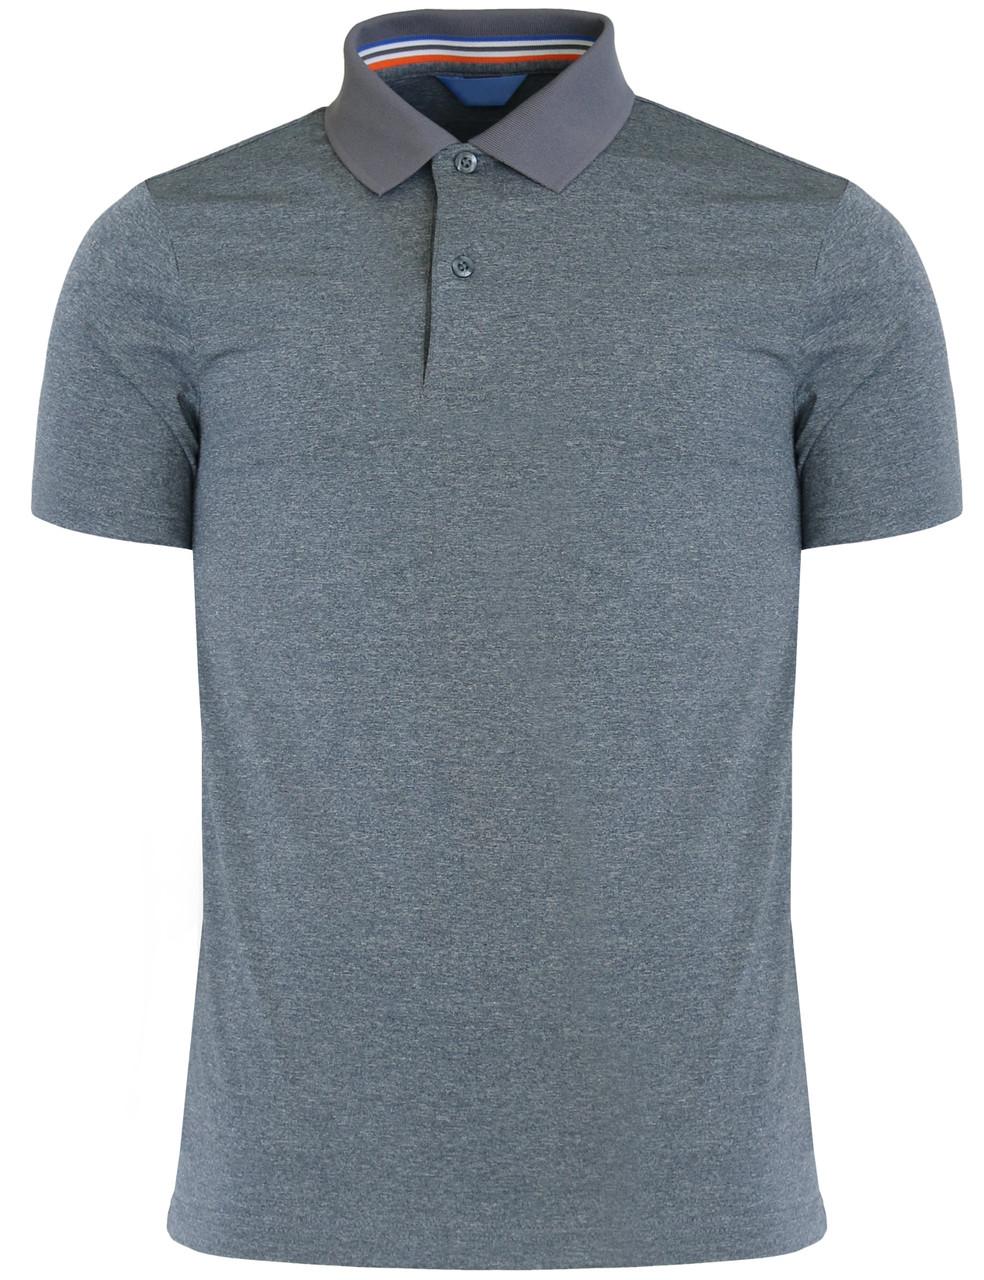 742fe9024ed ... Dri Fit Spandex Polo Shirt-Unisex · melange · melange